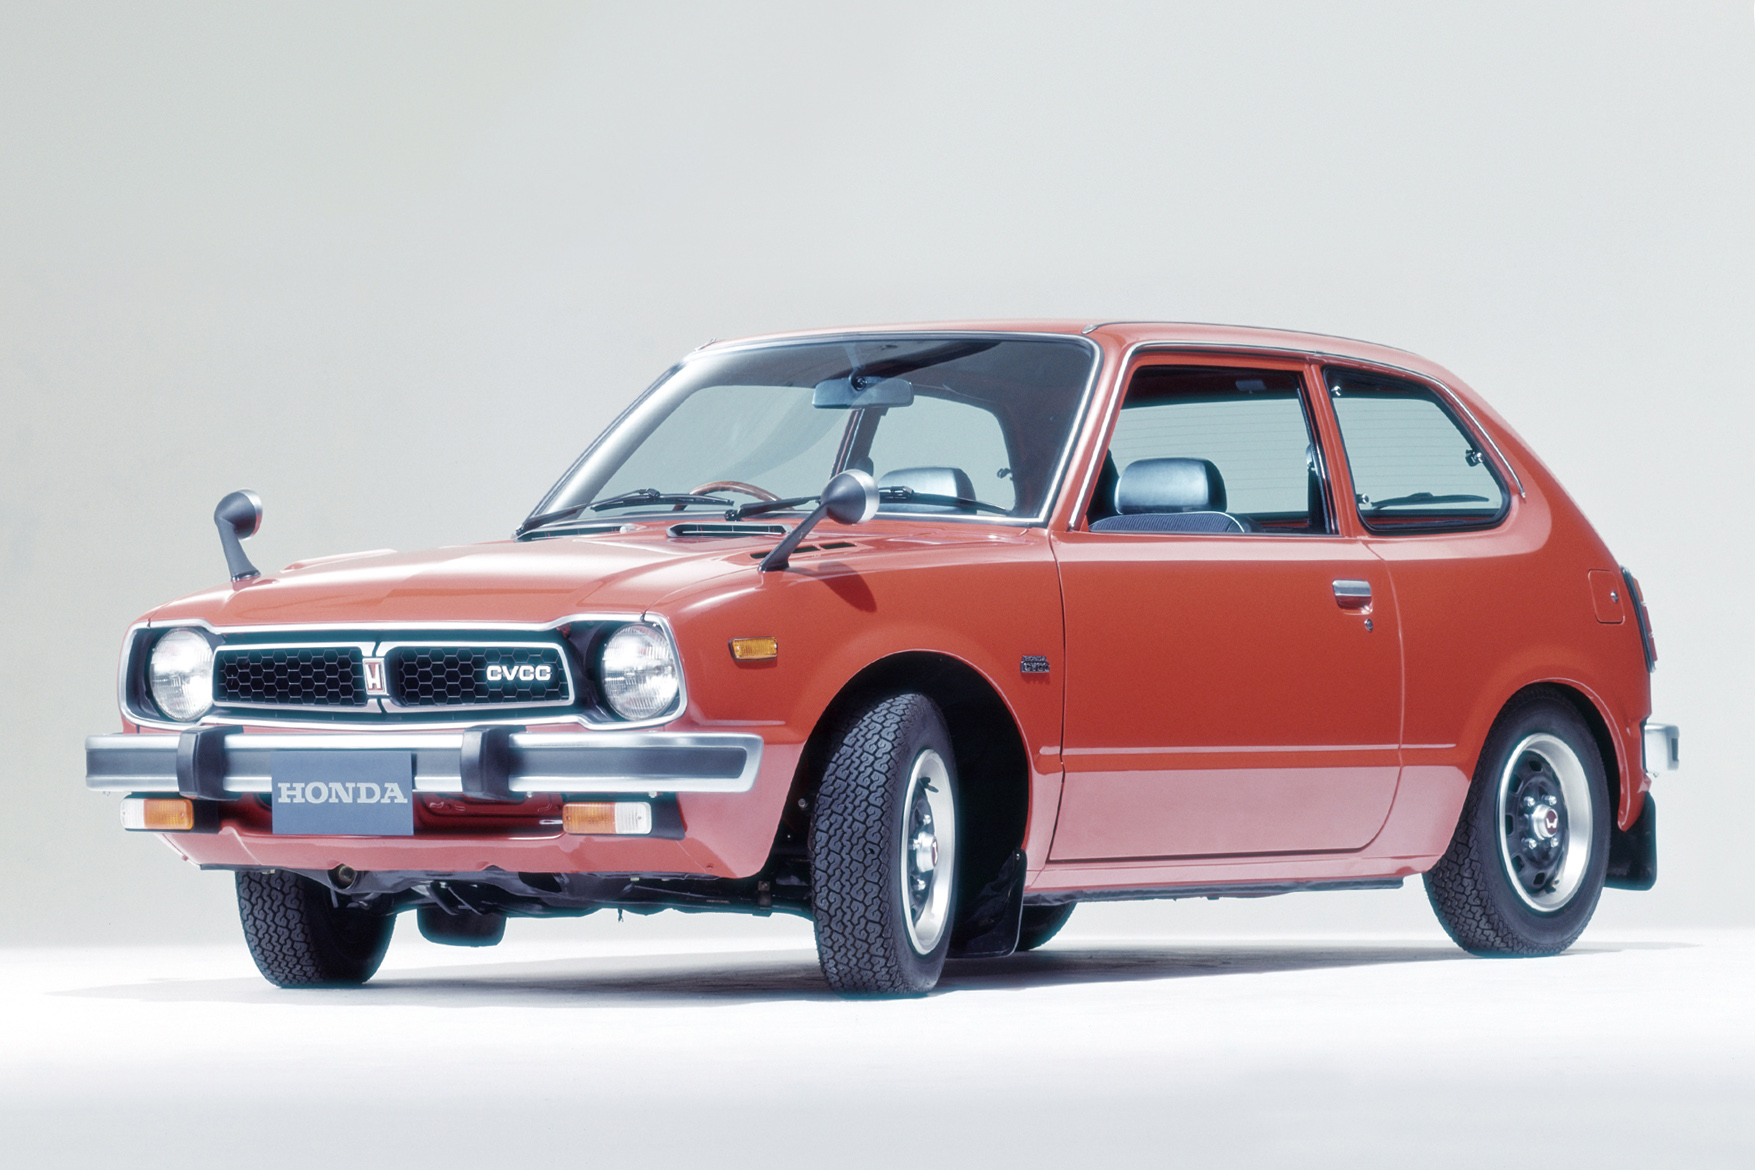 Great Images Courtesy Of Honda.